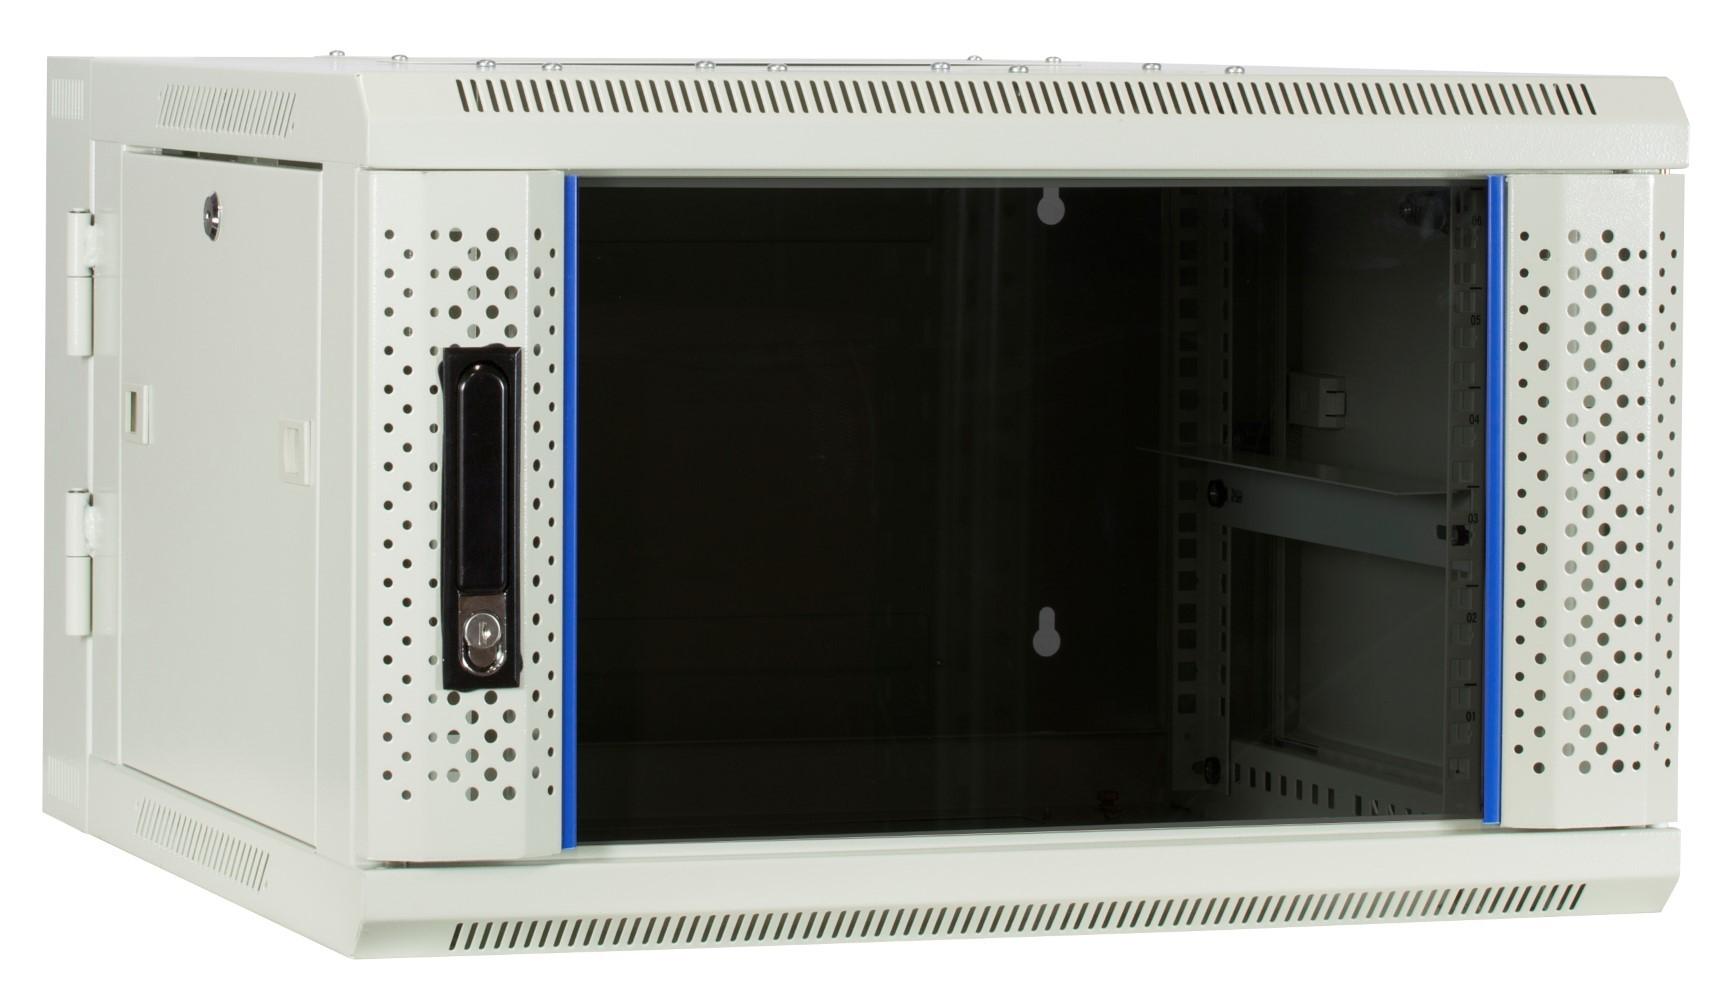 Afbeelding van 6U witte wandkast - kantelbaar met glazen deur 600x600x368mm